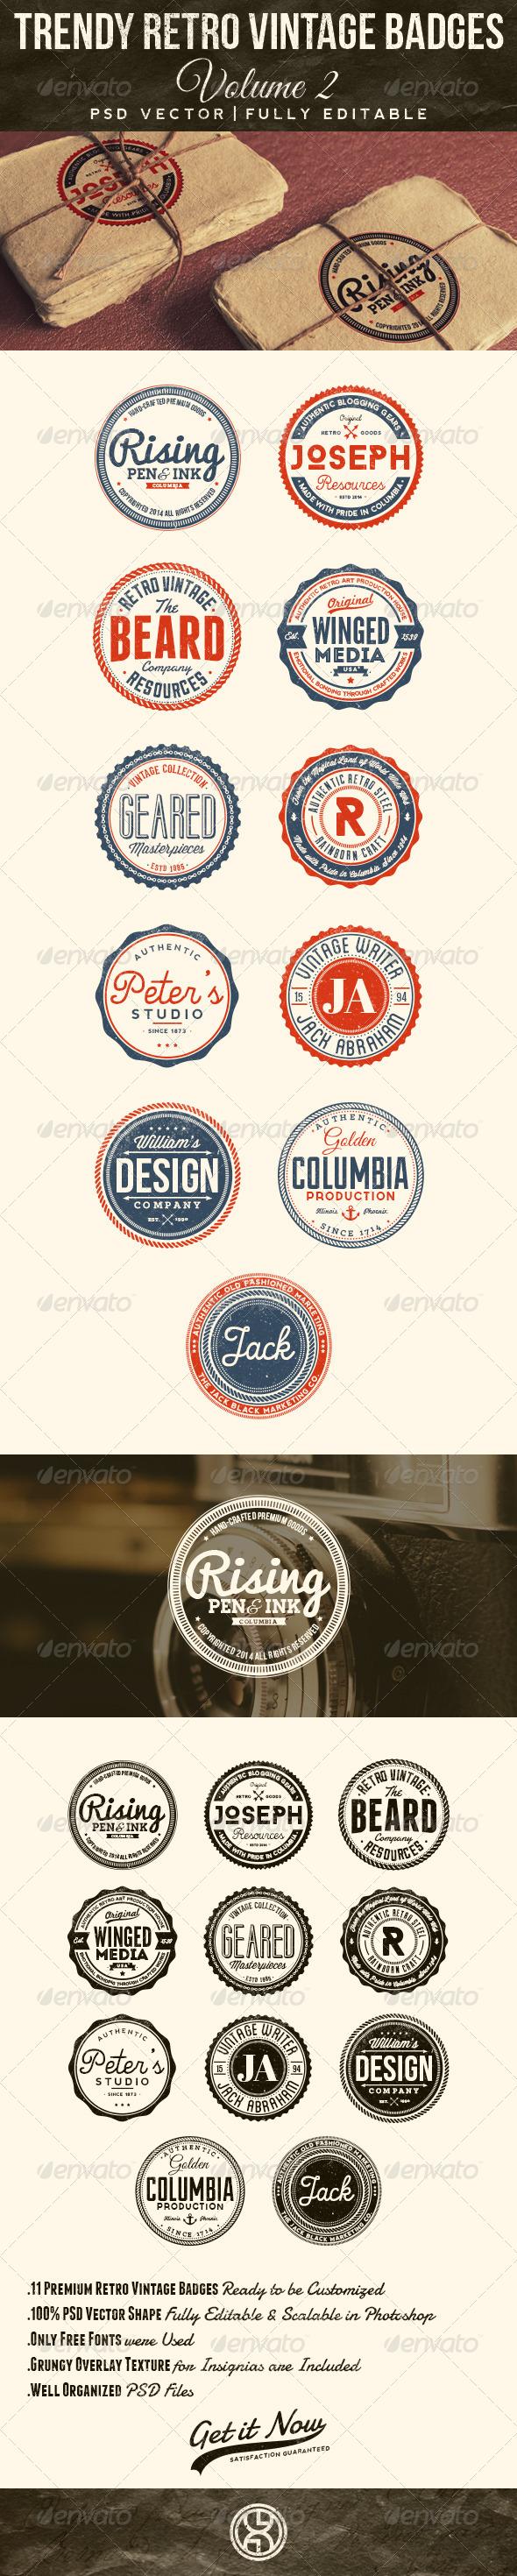 GraphicRiver Trendy Retro Vintage Badges Volume 2 7586669